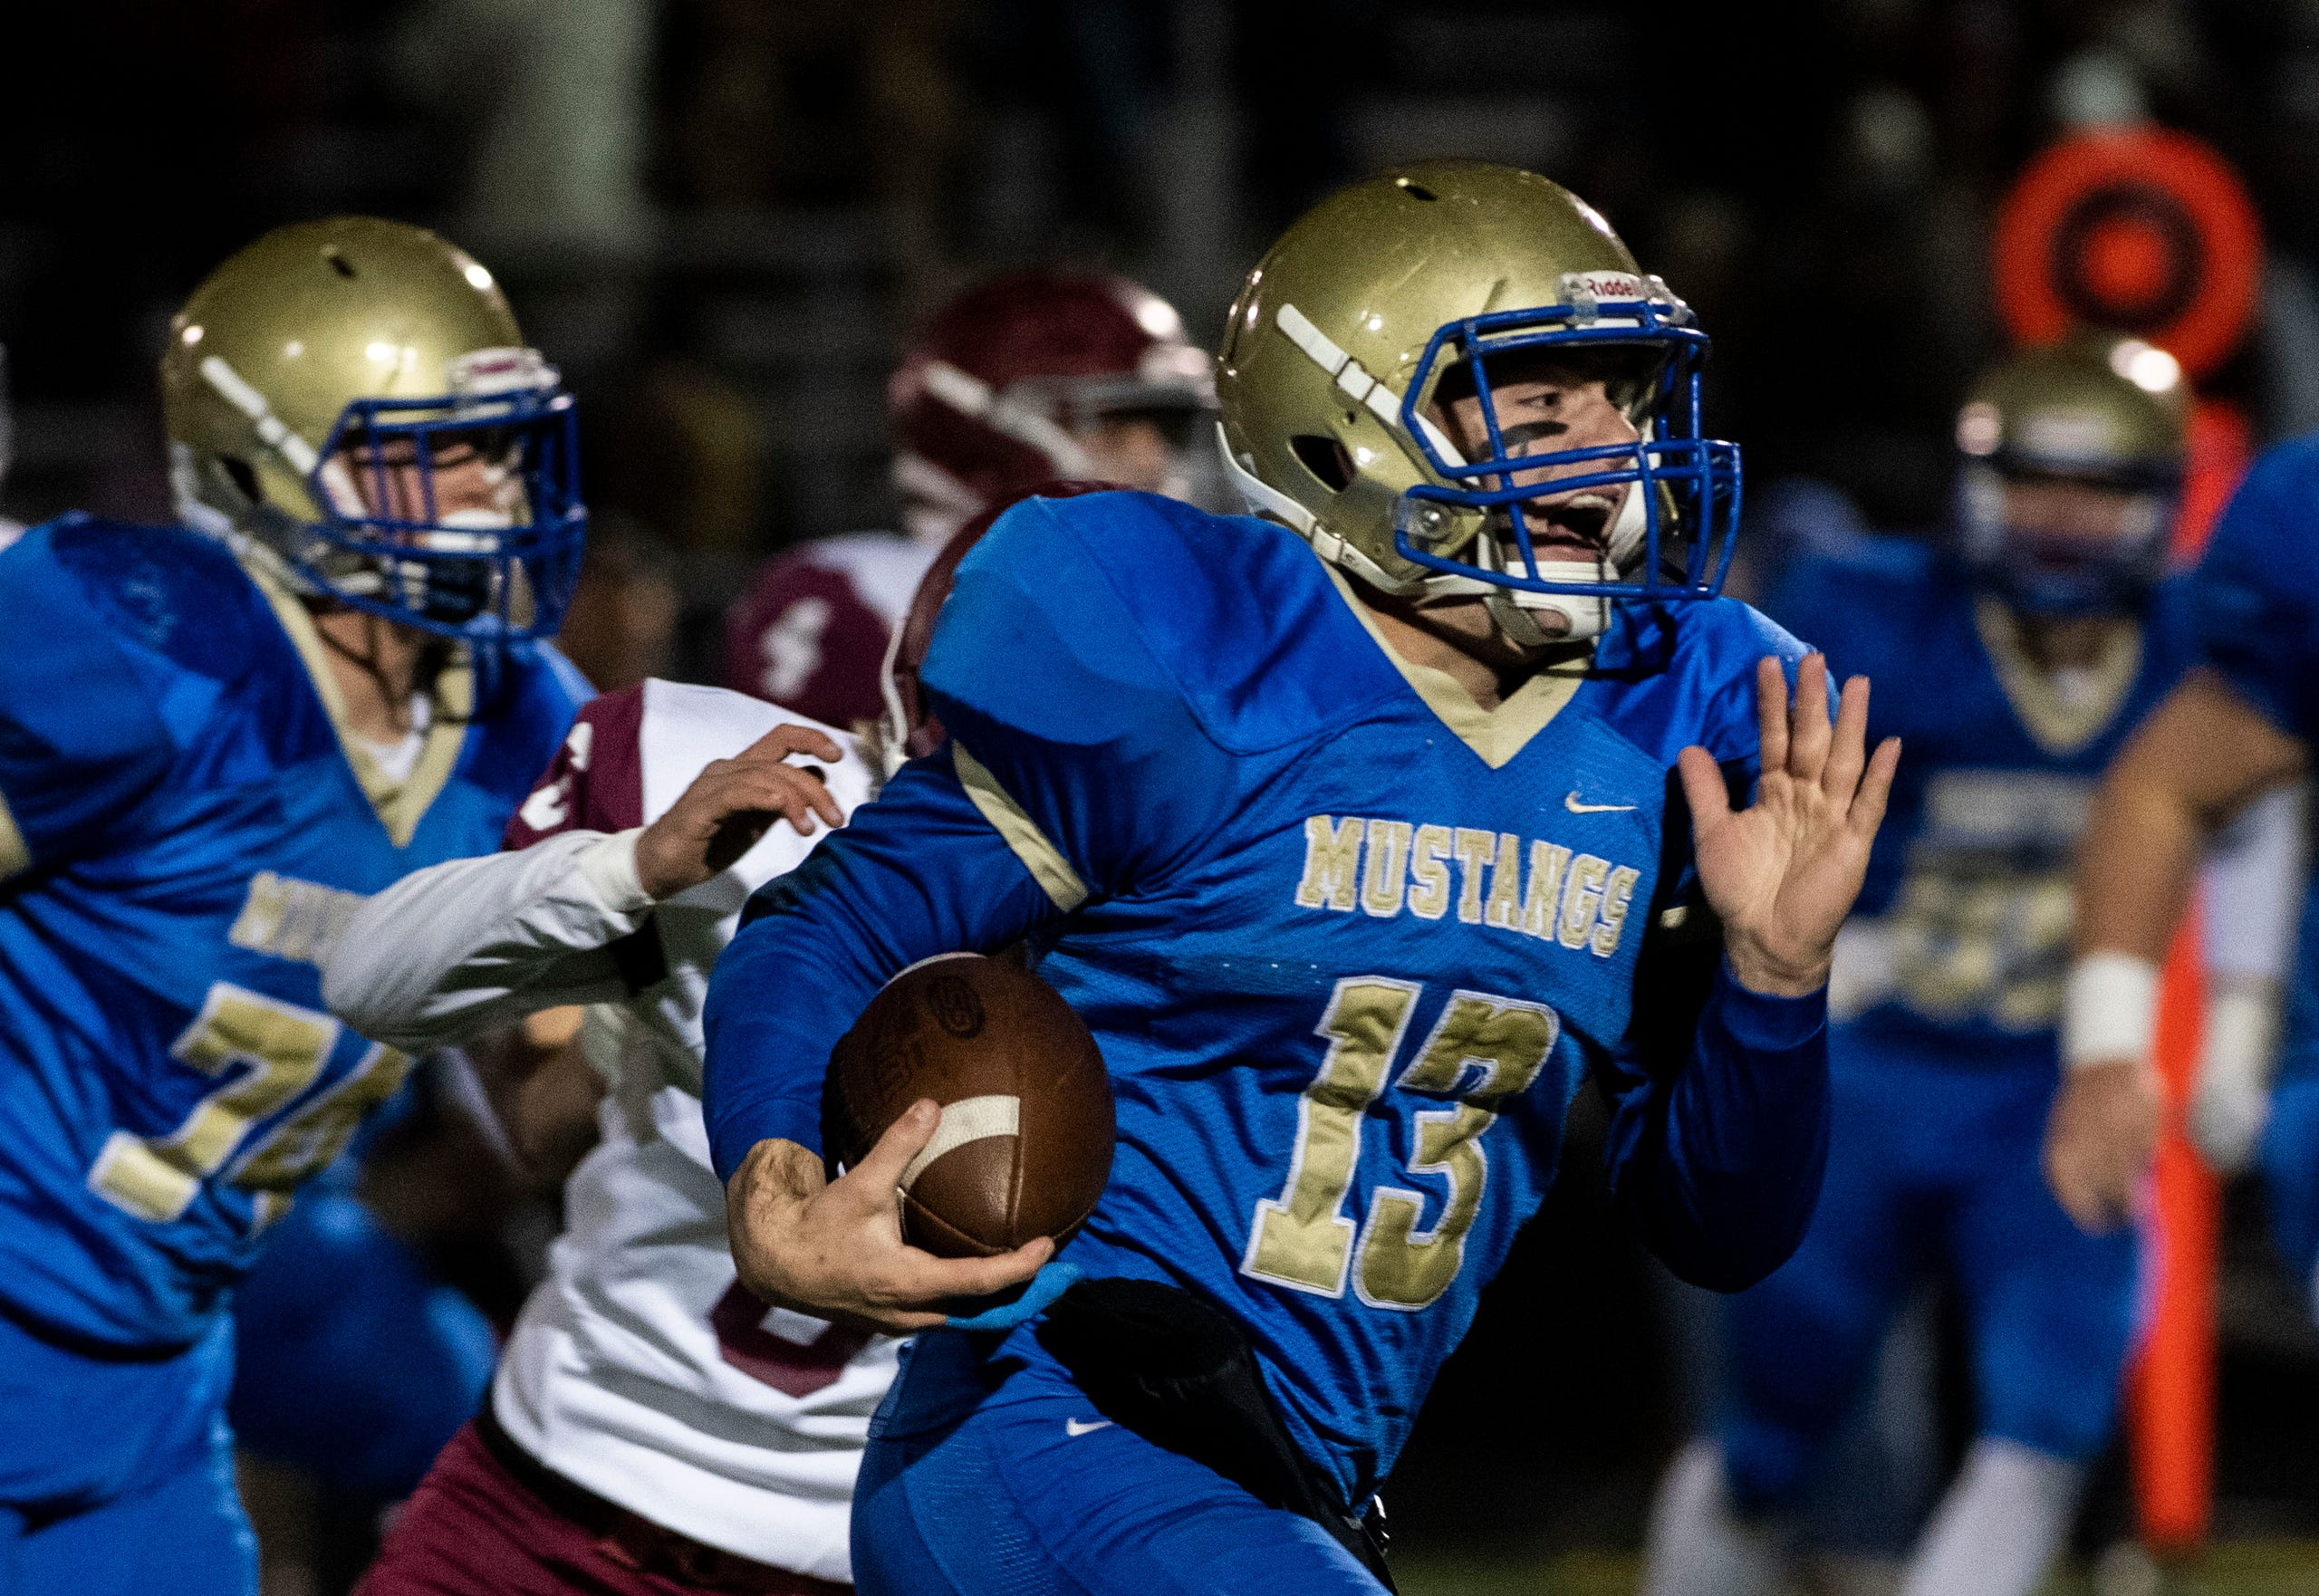 Tssaa High School Football Playoffs Huntingdon Vs Cornersville In Pictures